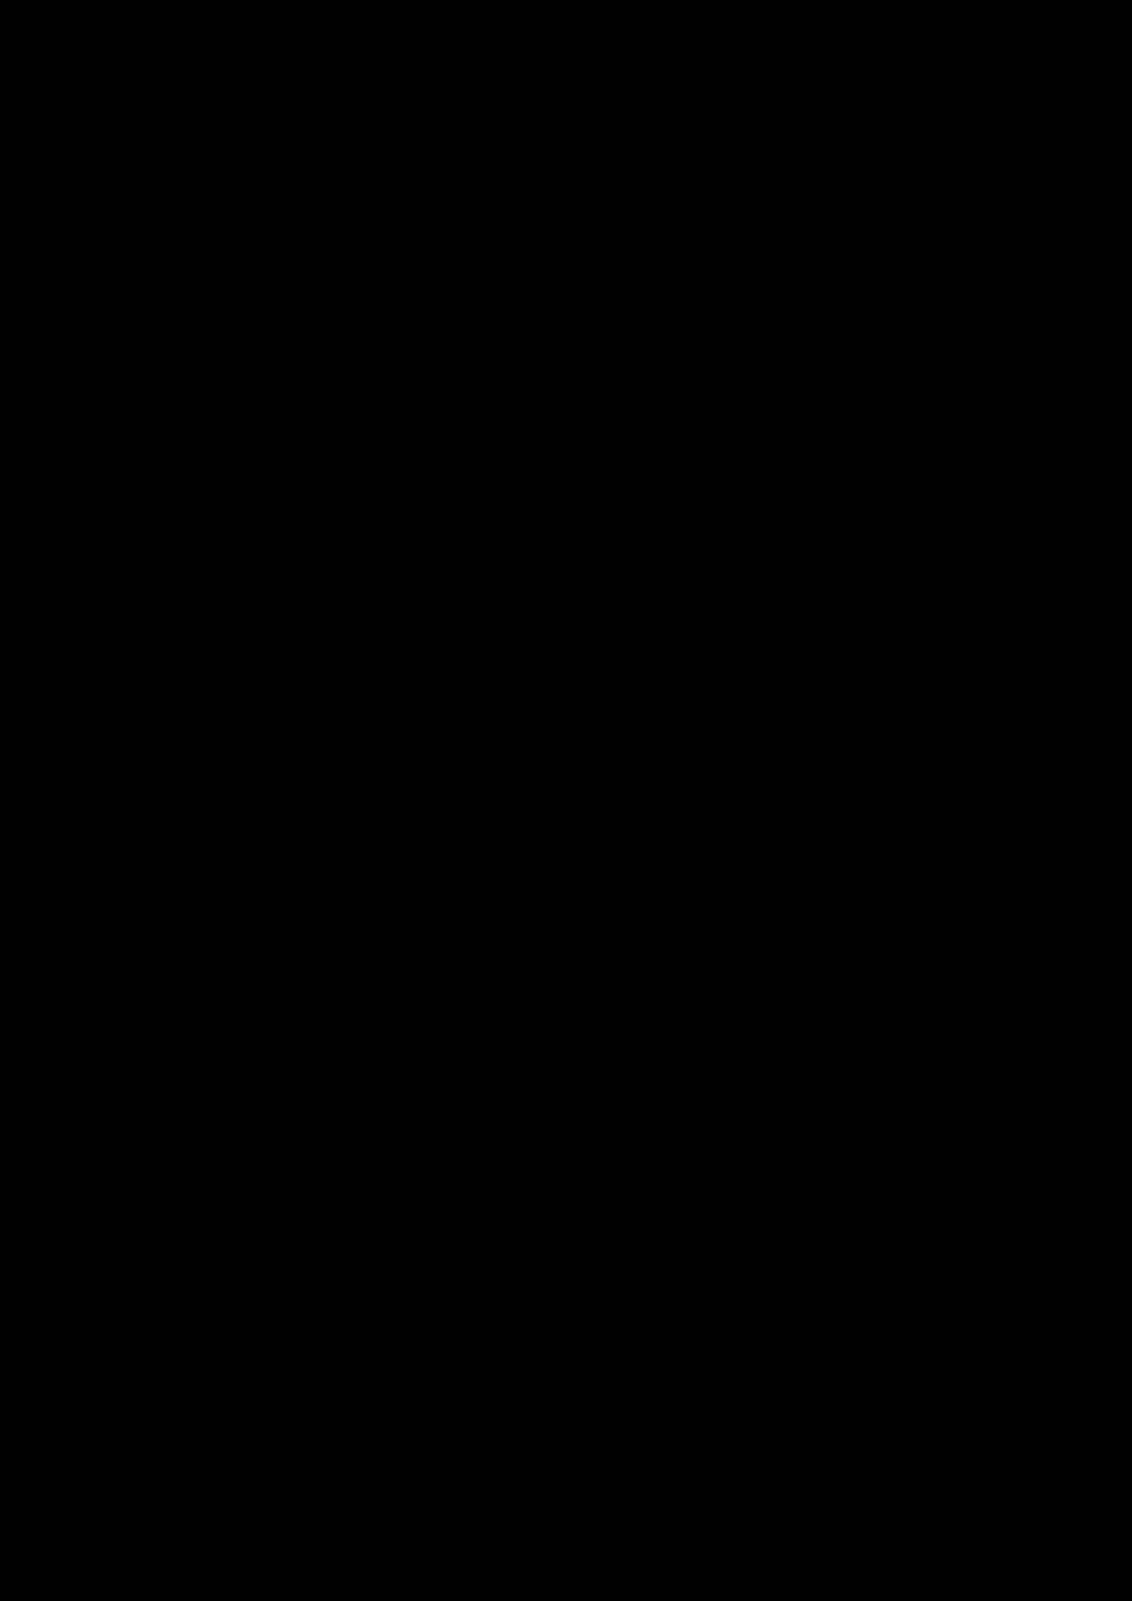 Prosti slide, Image 42